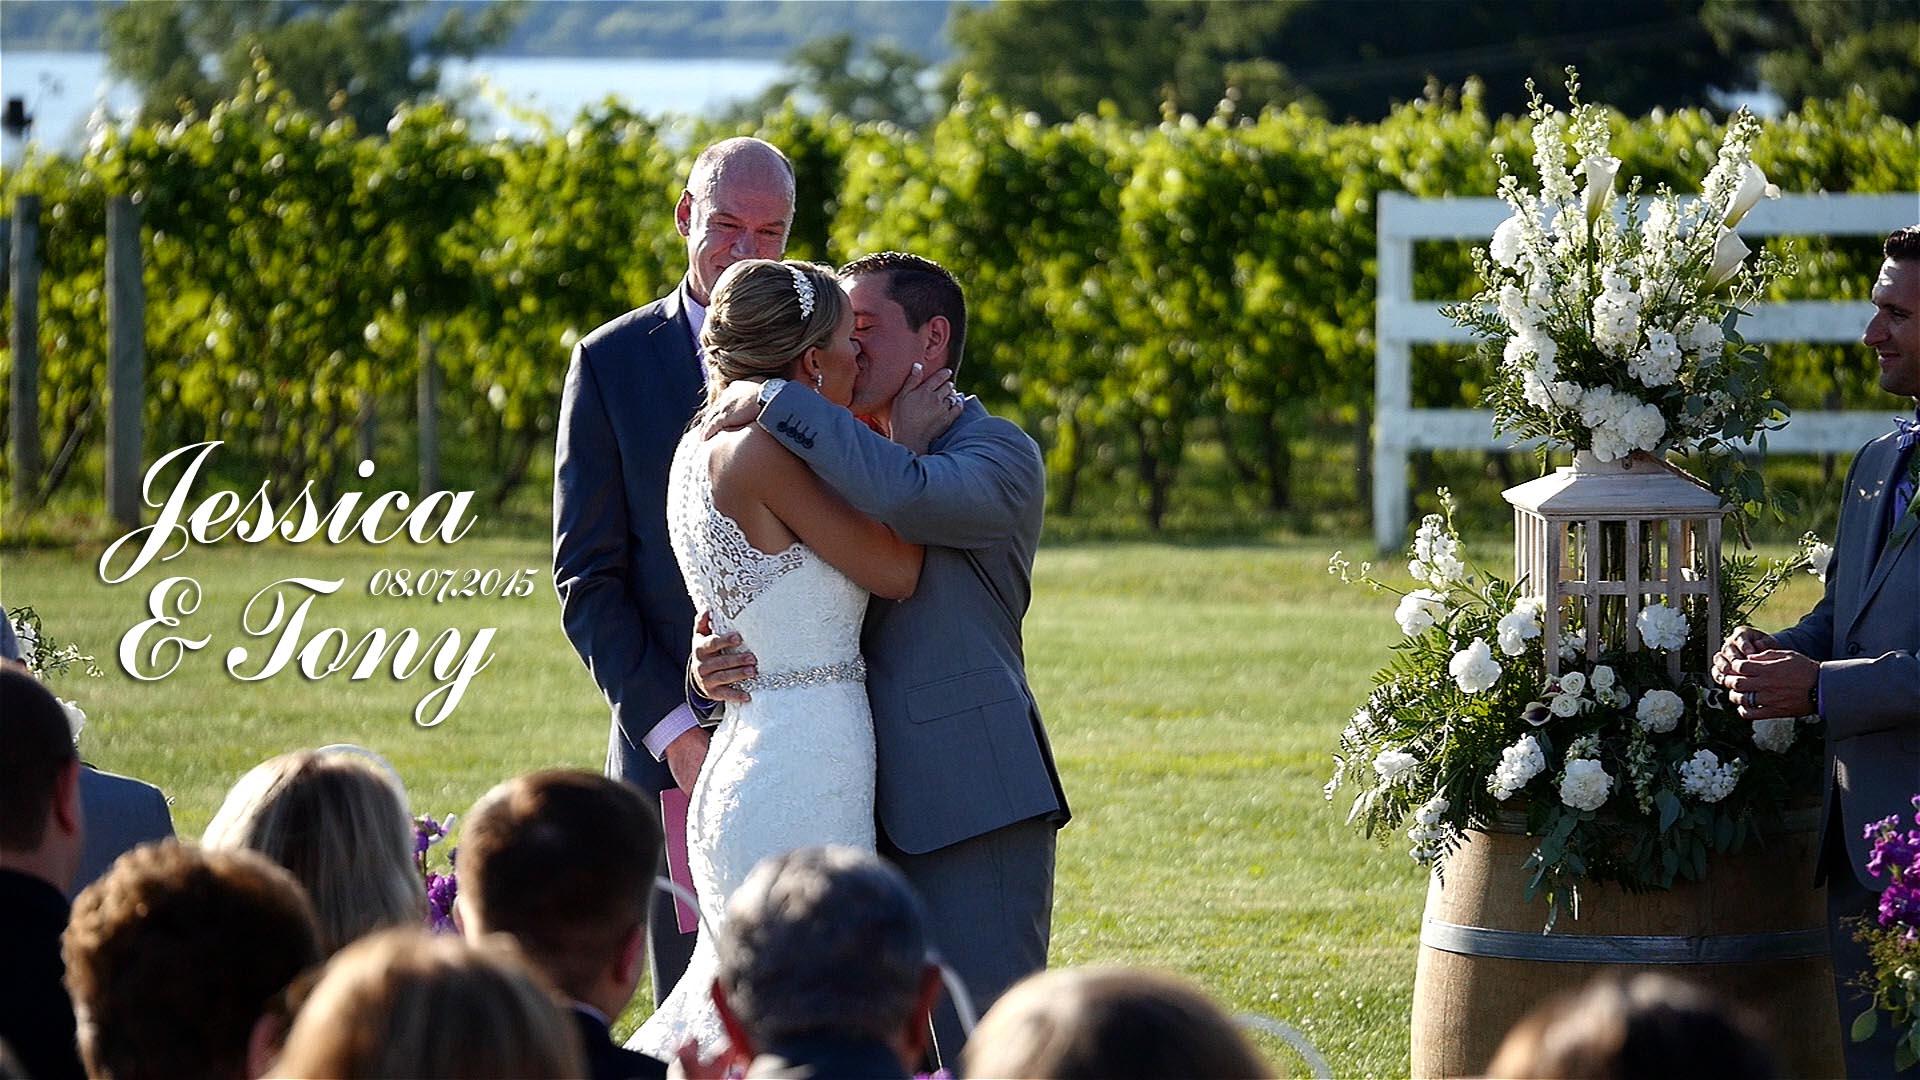 Jessica & Tony – Finger Lakes Wedding Video